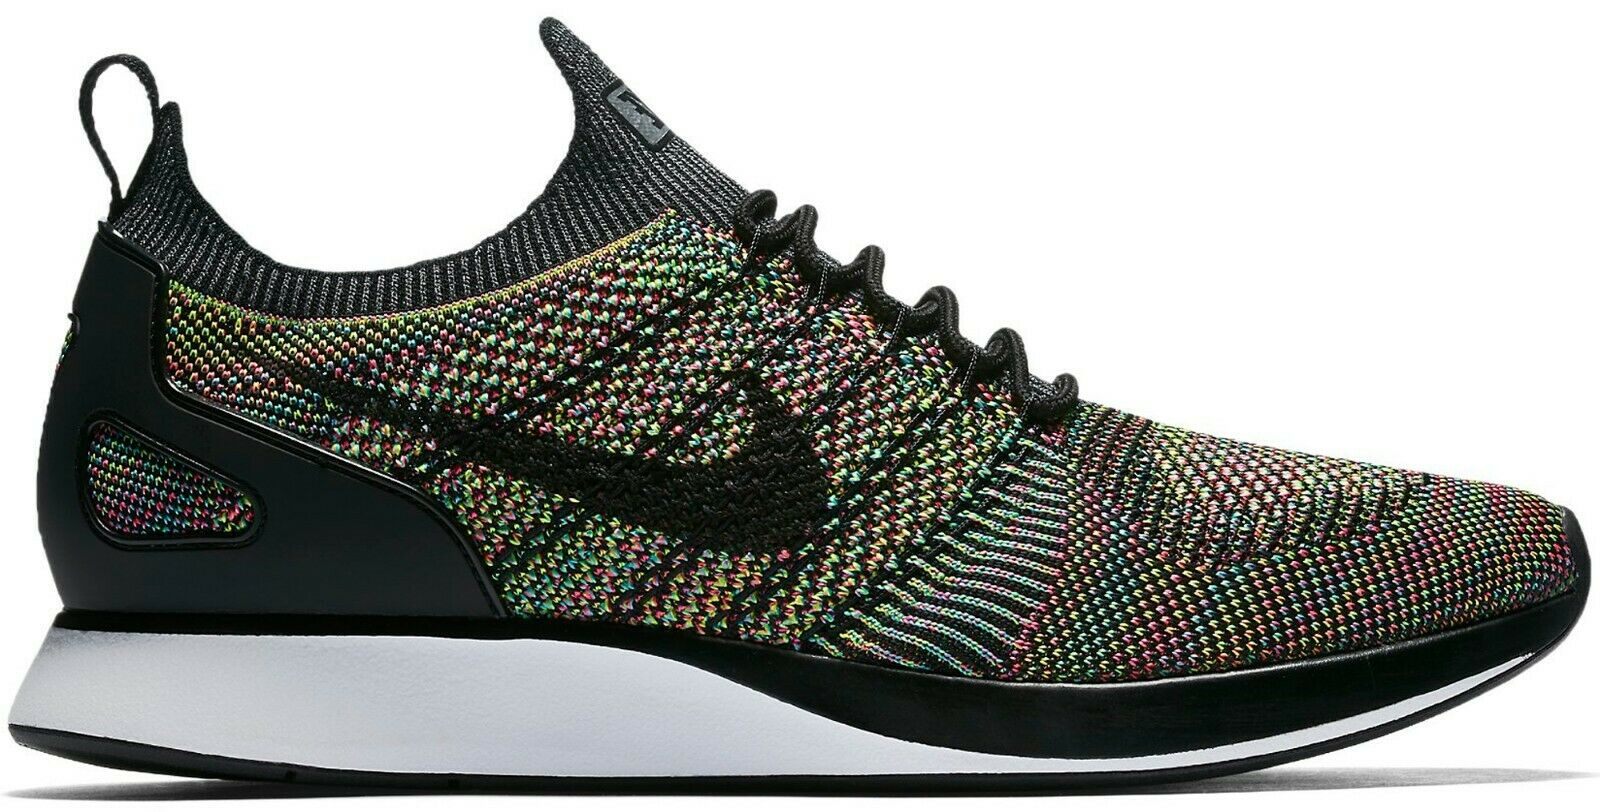 Mens Nike Air Zoom Mariah Flyknit Racer 918264-101 White Black Size 14 US 49 EUR